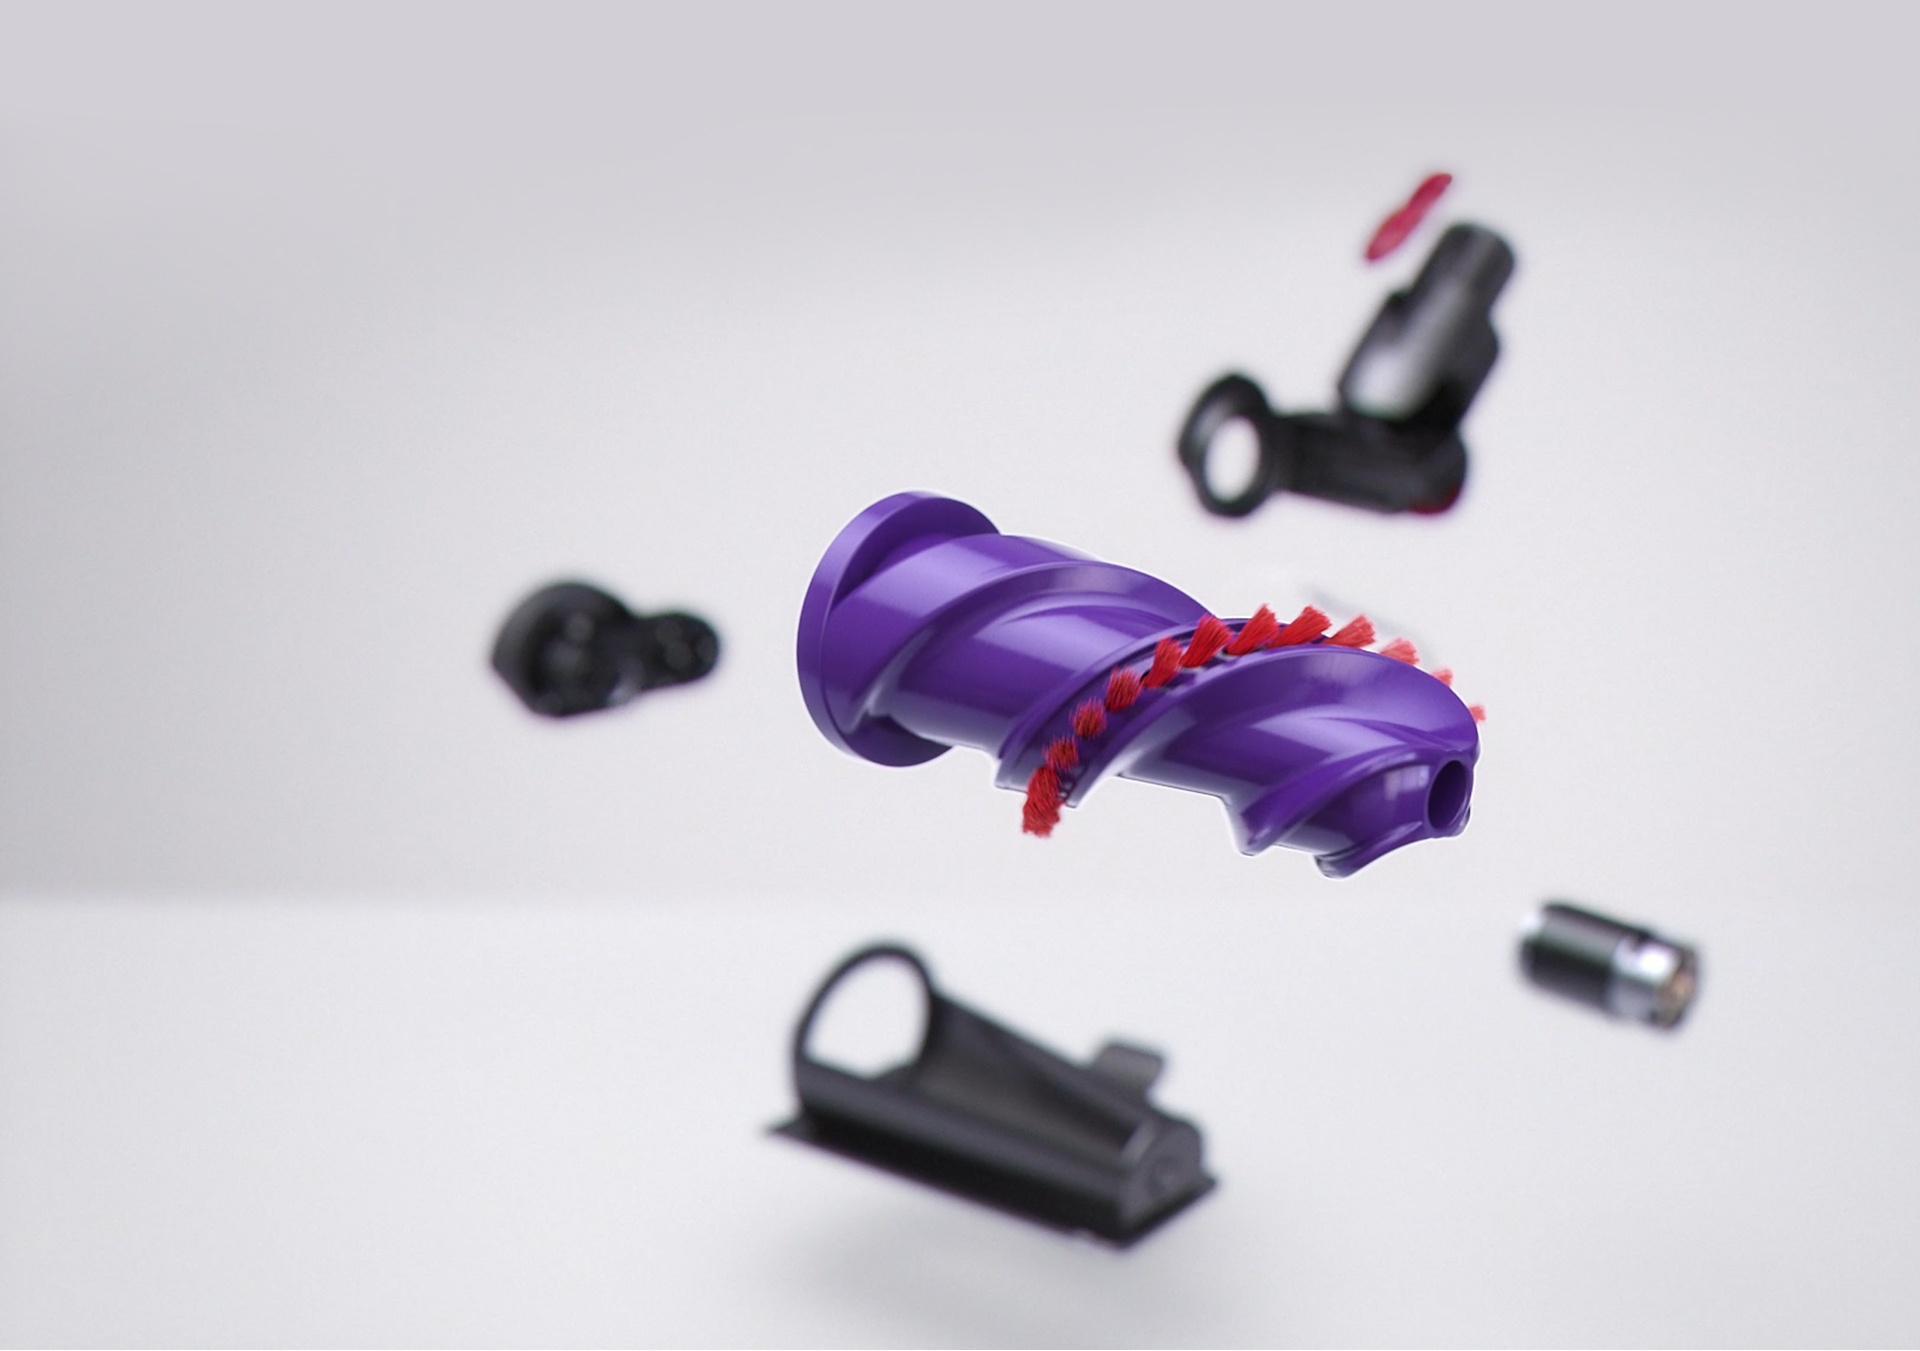 Close-up of Hair screw tool's threaded brush bar